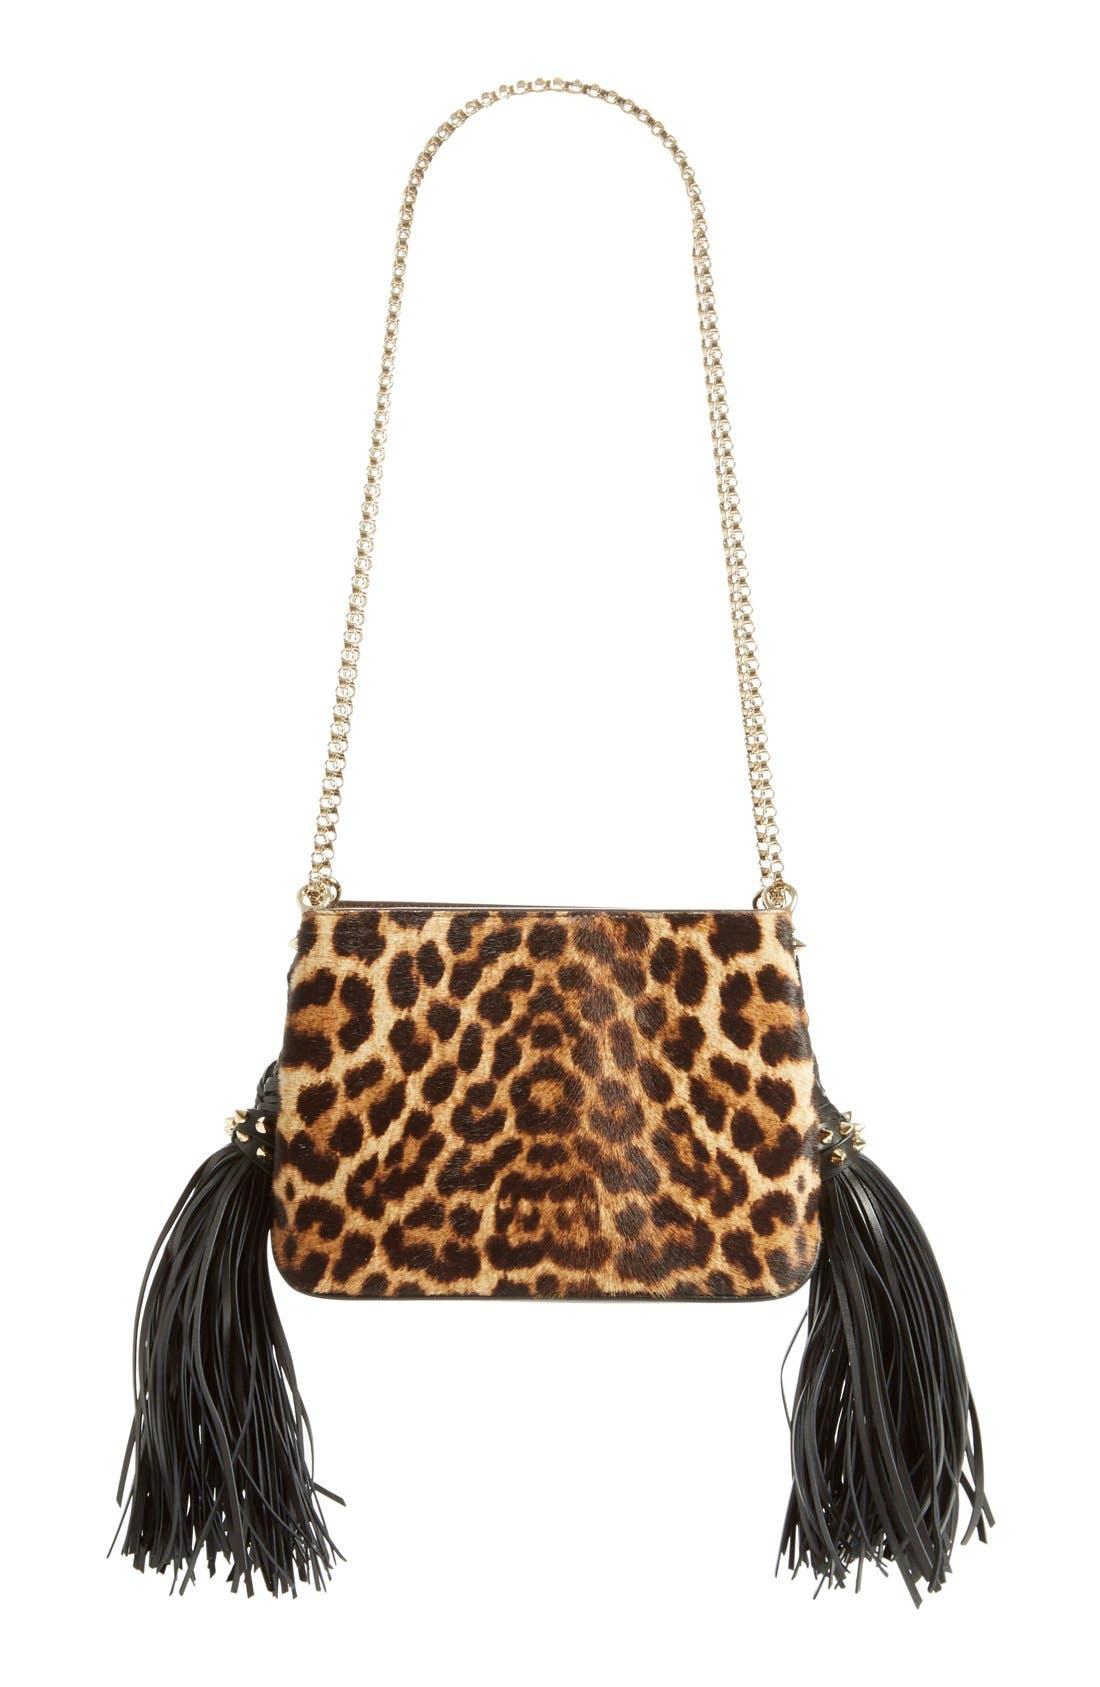 Main Image - Christian Louboutin 'Small Triloubi' Leopard Print Calf Hair Handbag